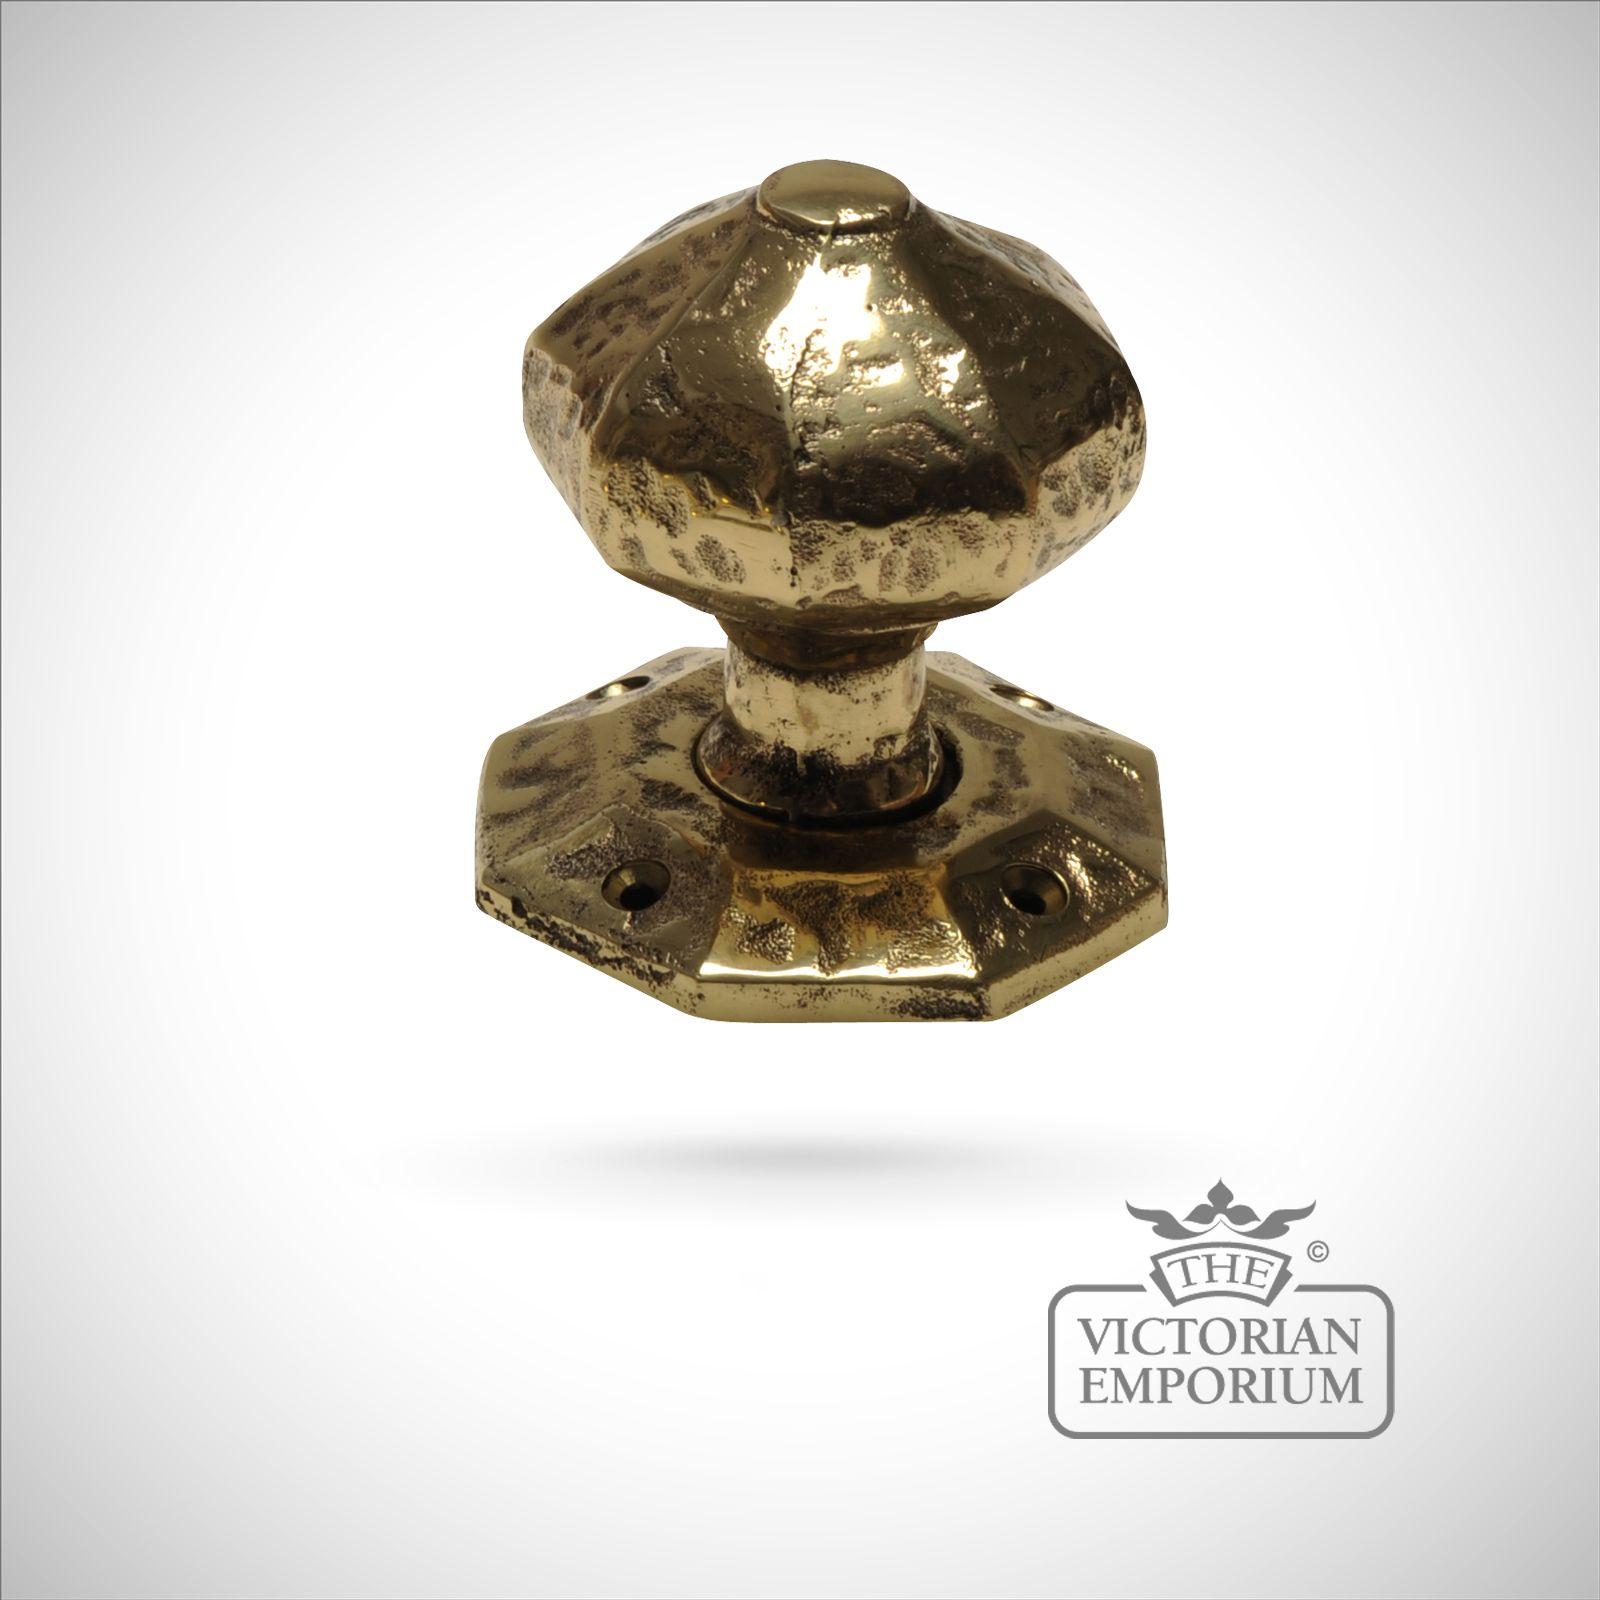 Cast Brass Door Knob Knobs The Victorian Emporium